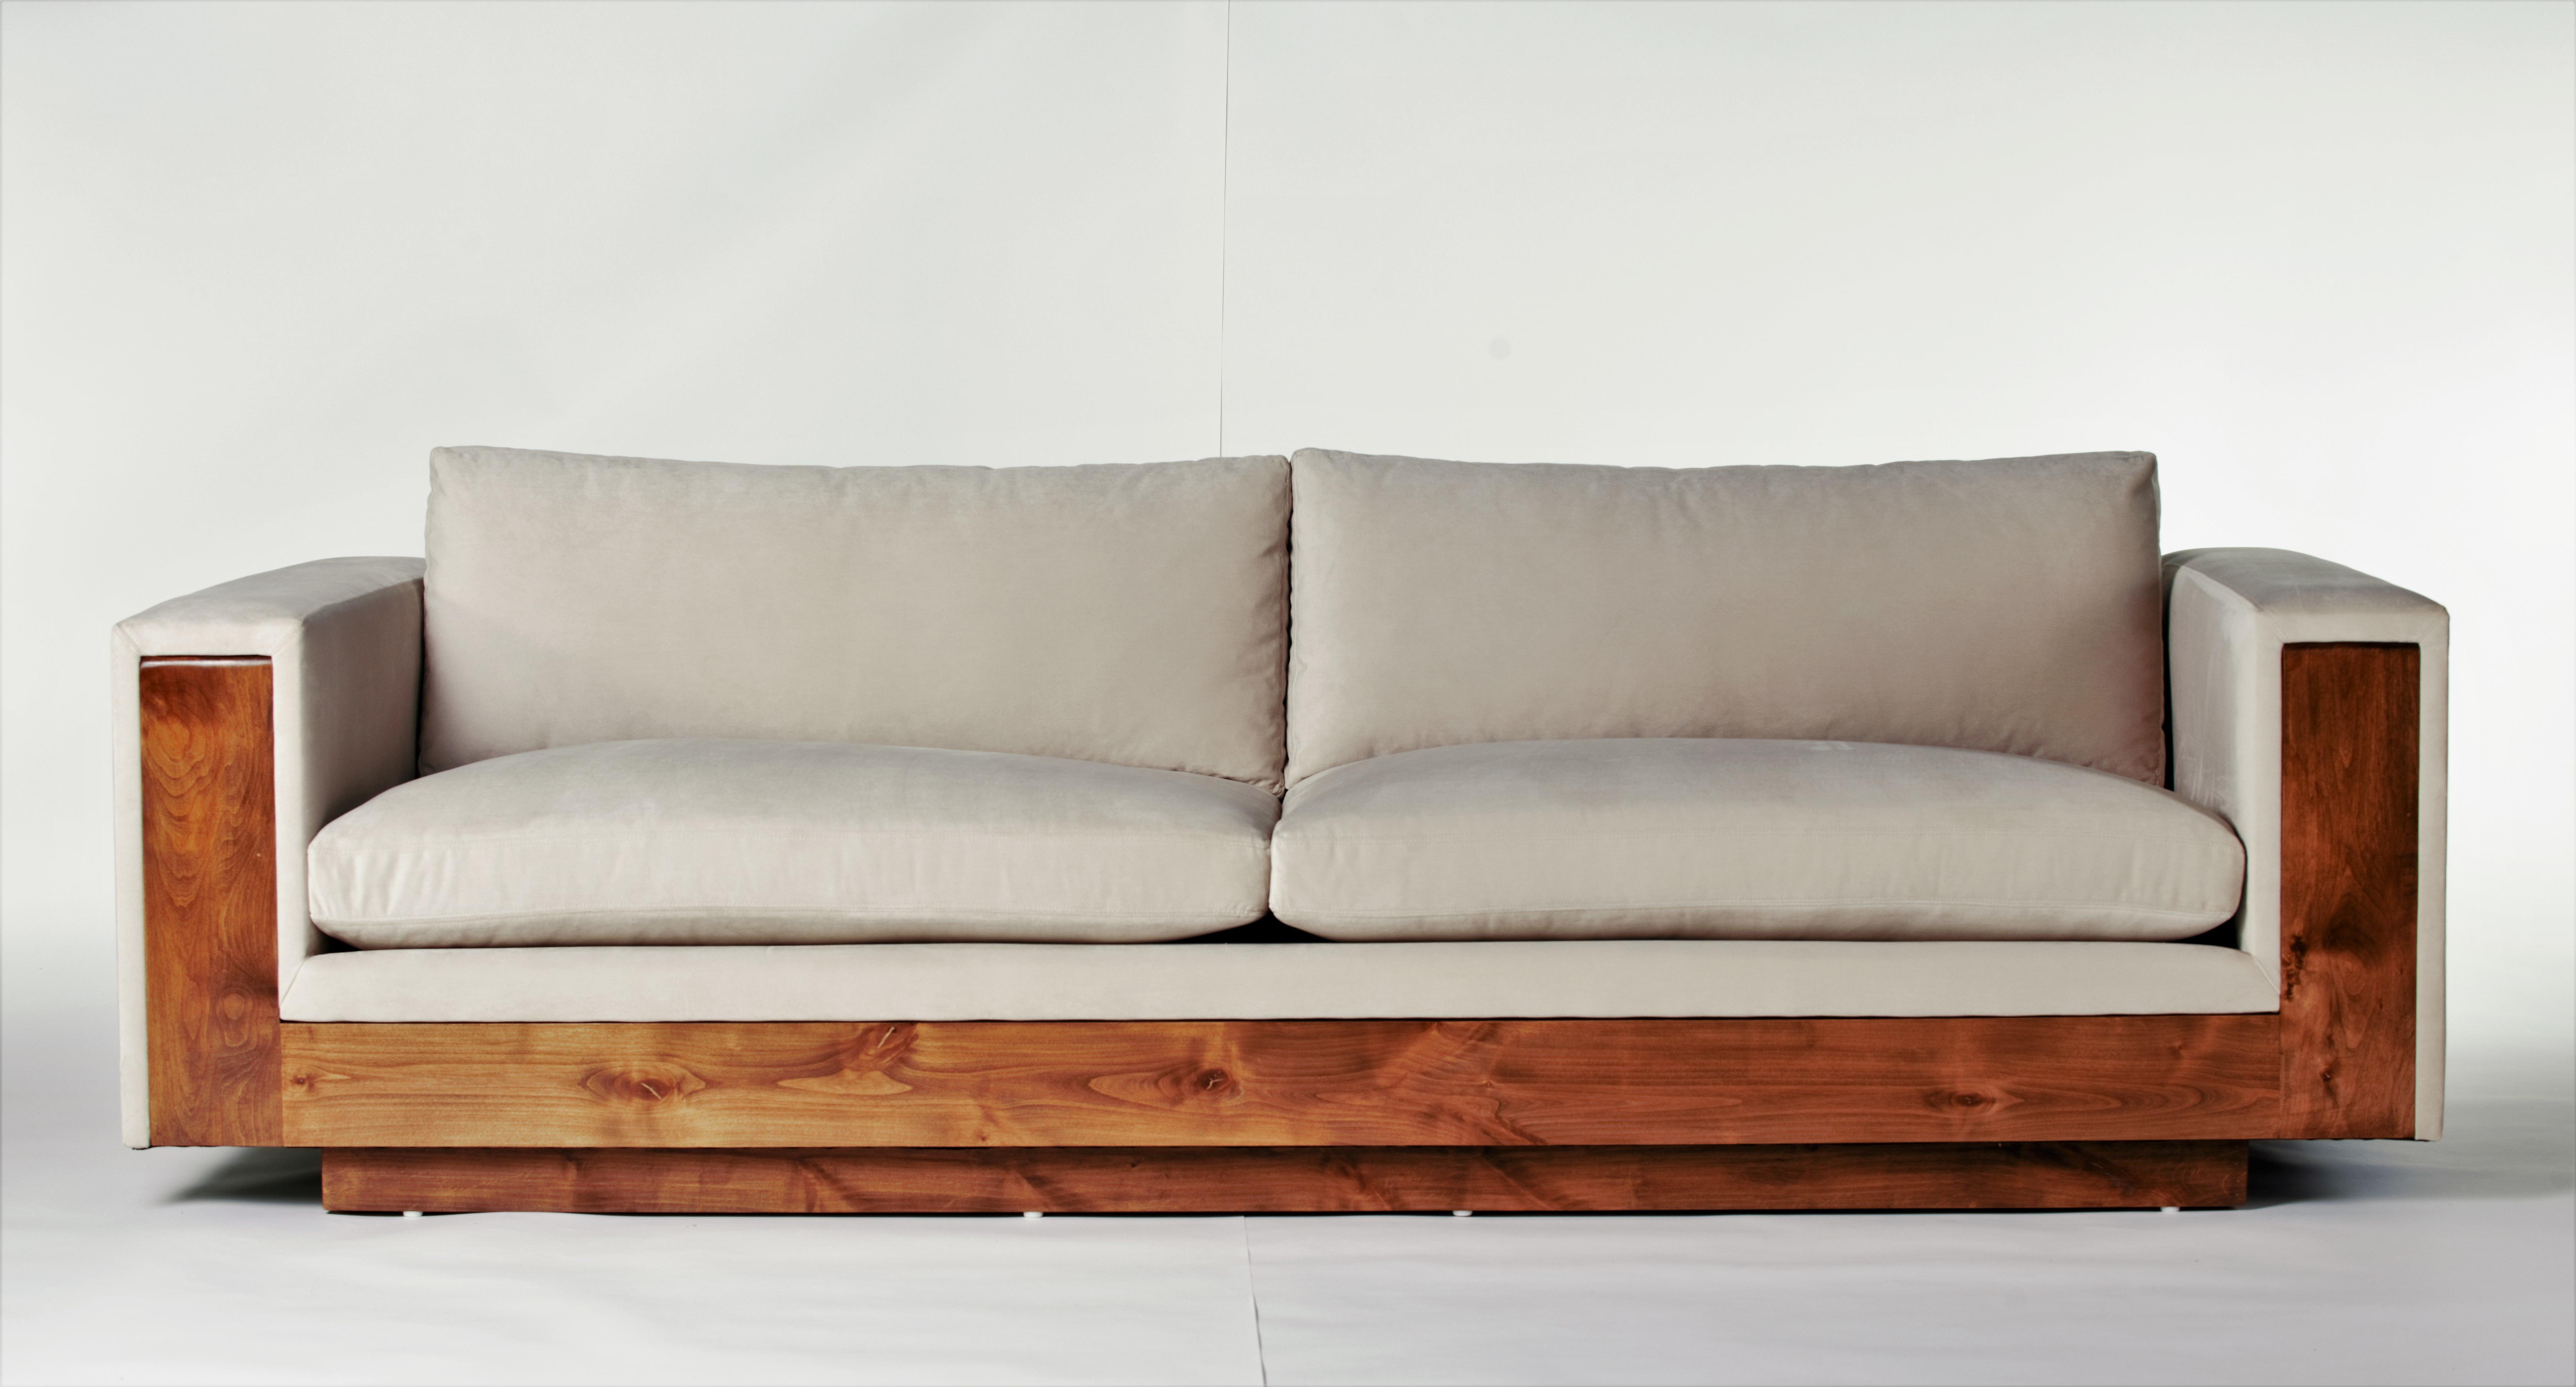 Sofas Leon X8d1 Corrigan Studio Leon sofa Wayfair